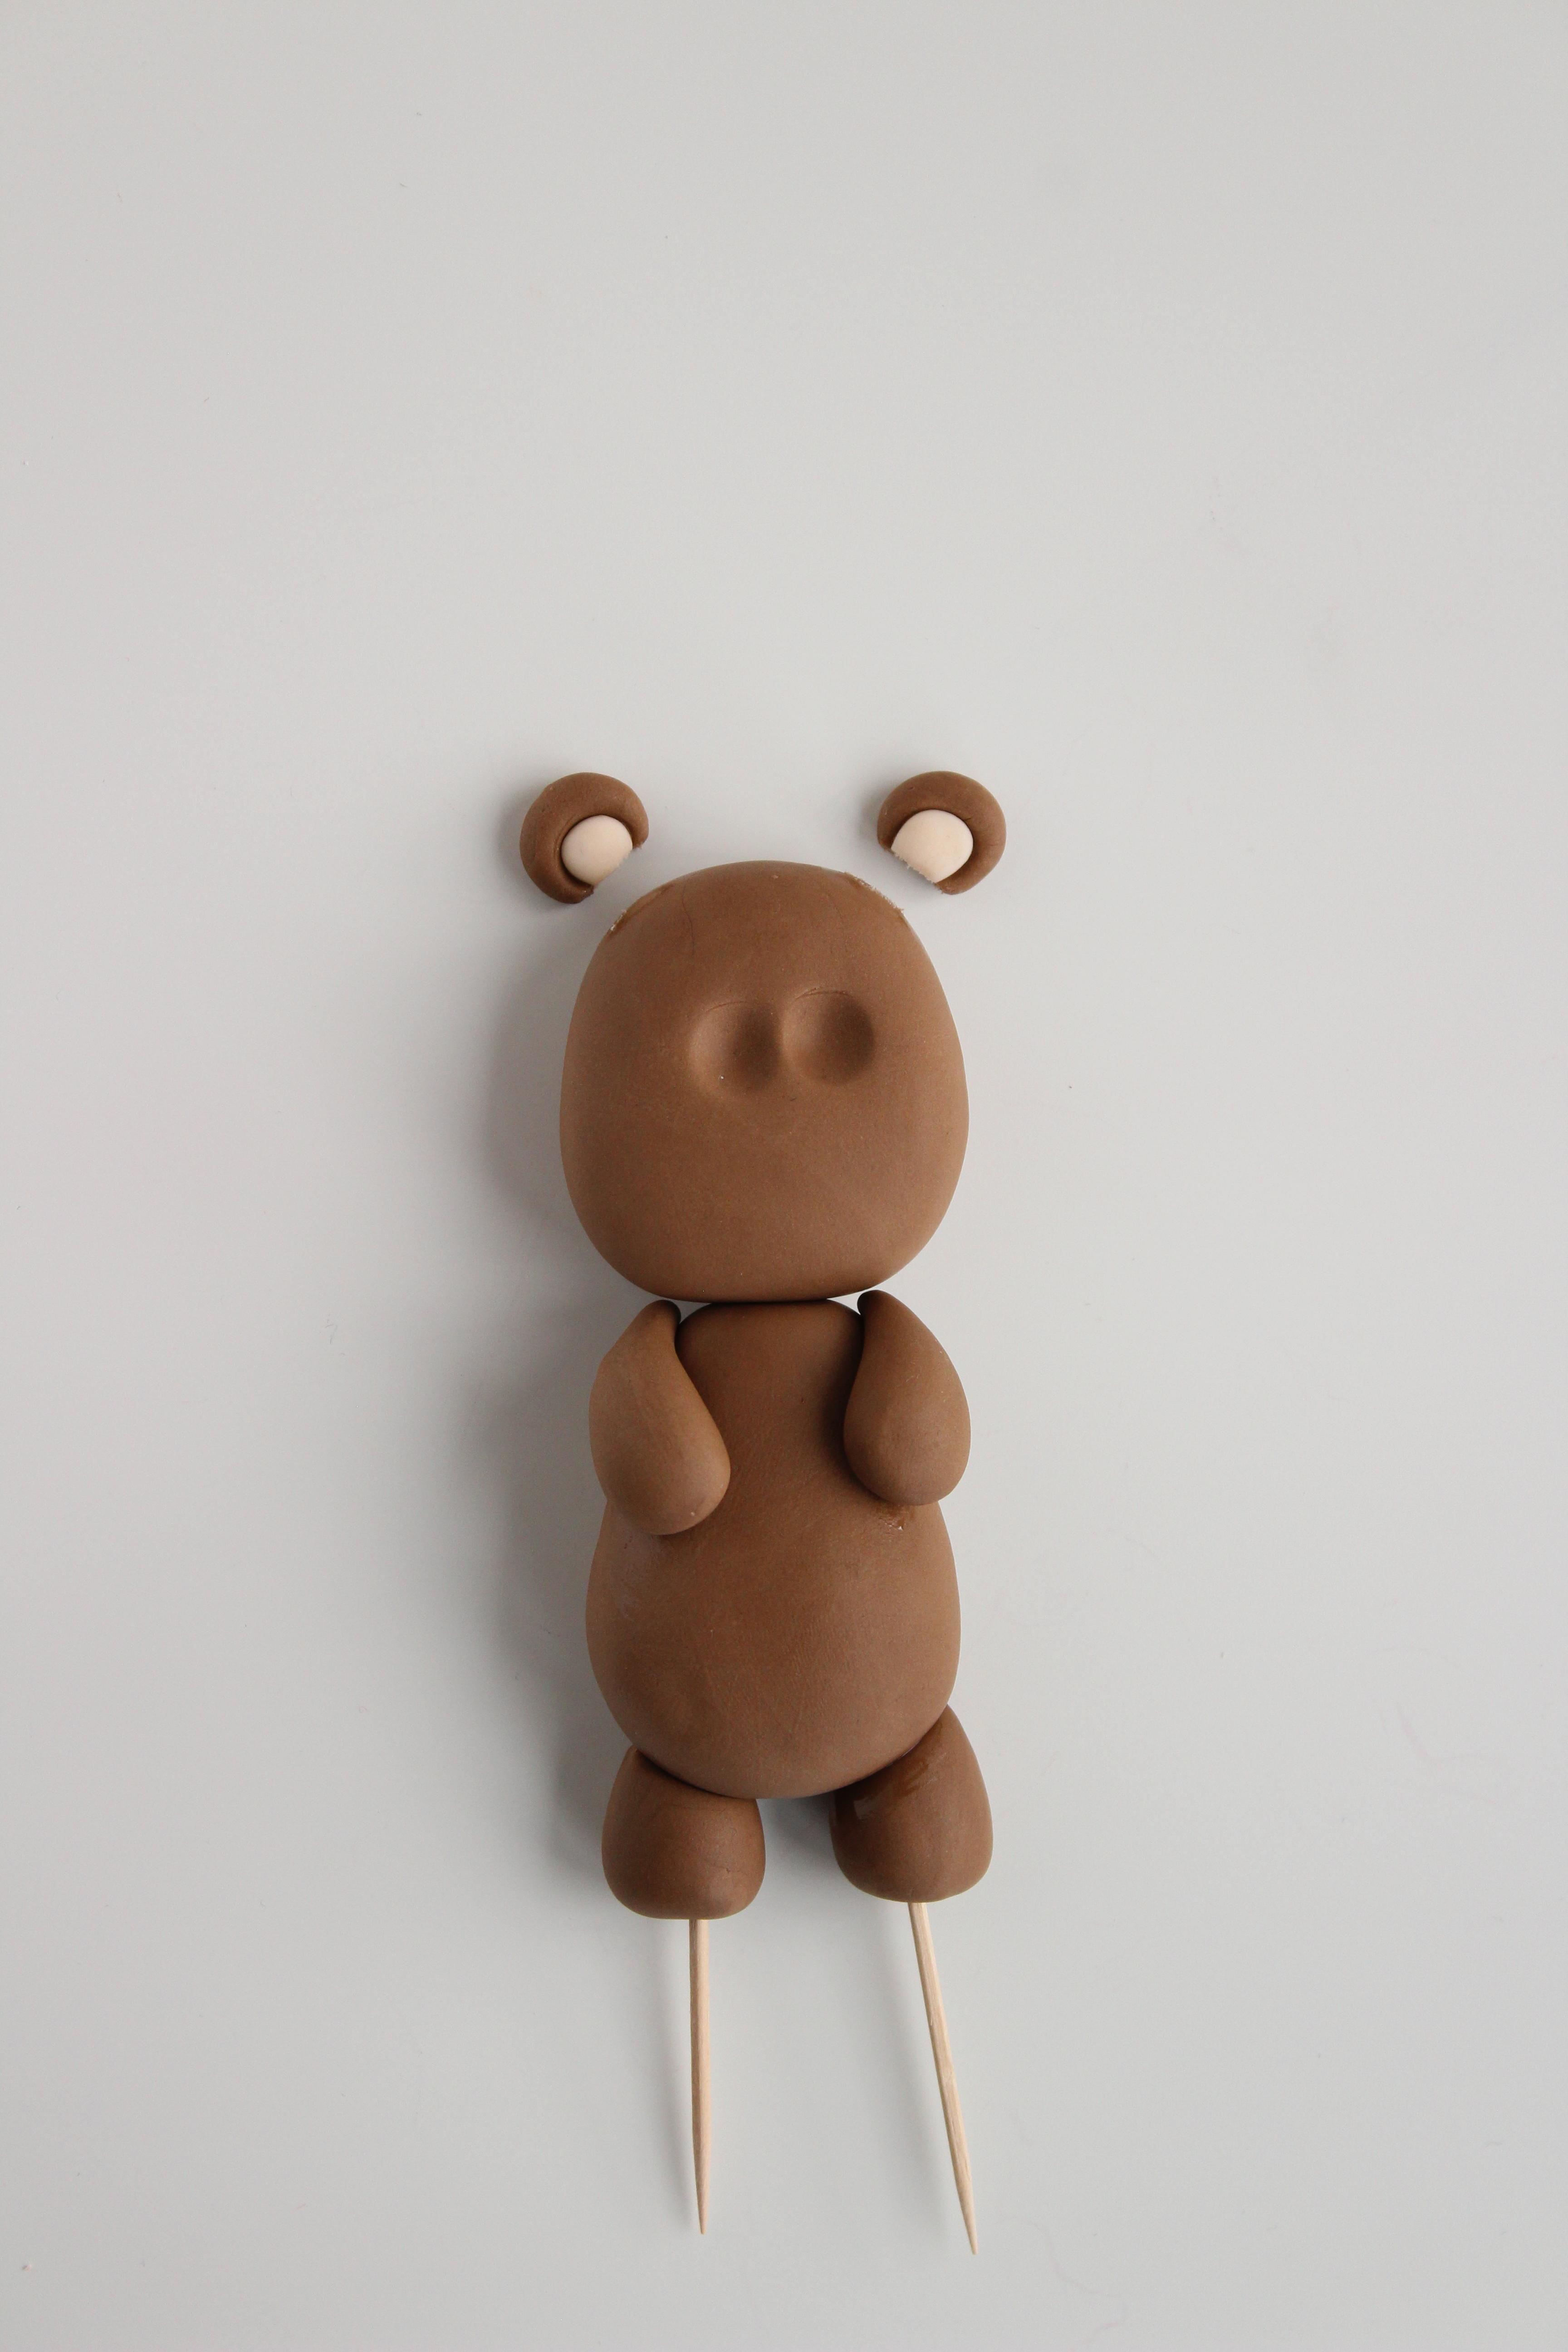 Party-Bear-Cake-5.JPG#asset:23966